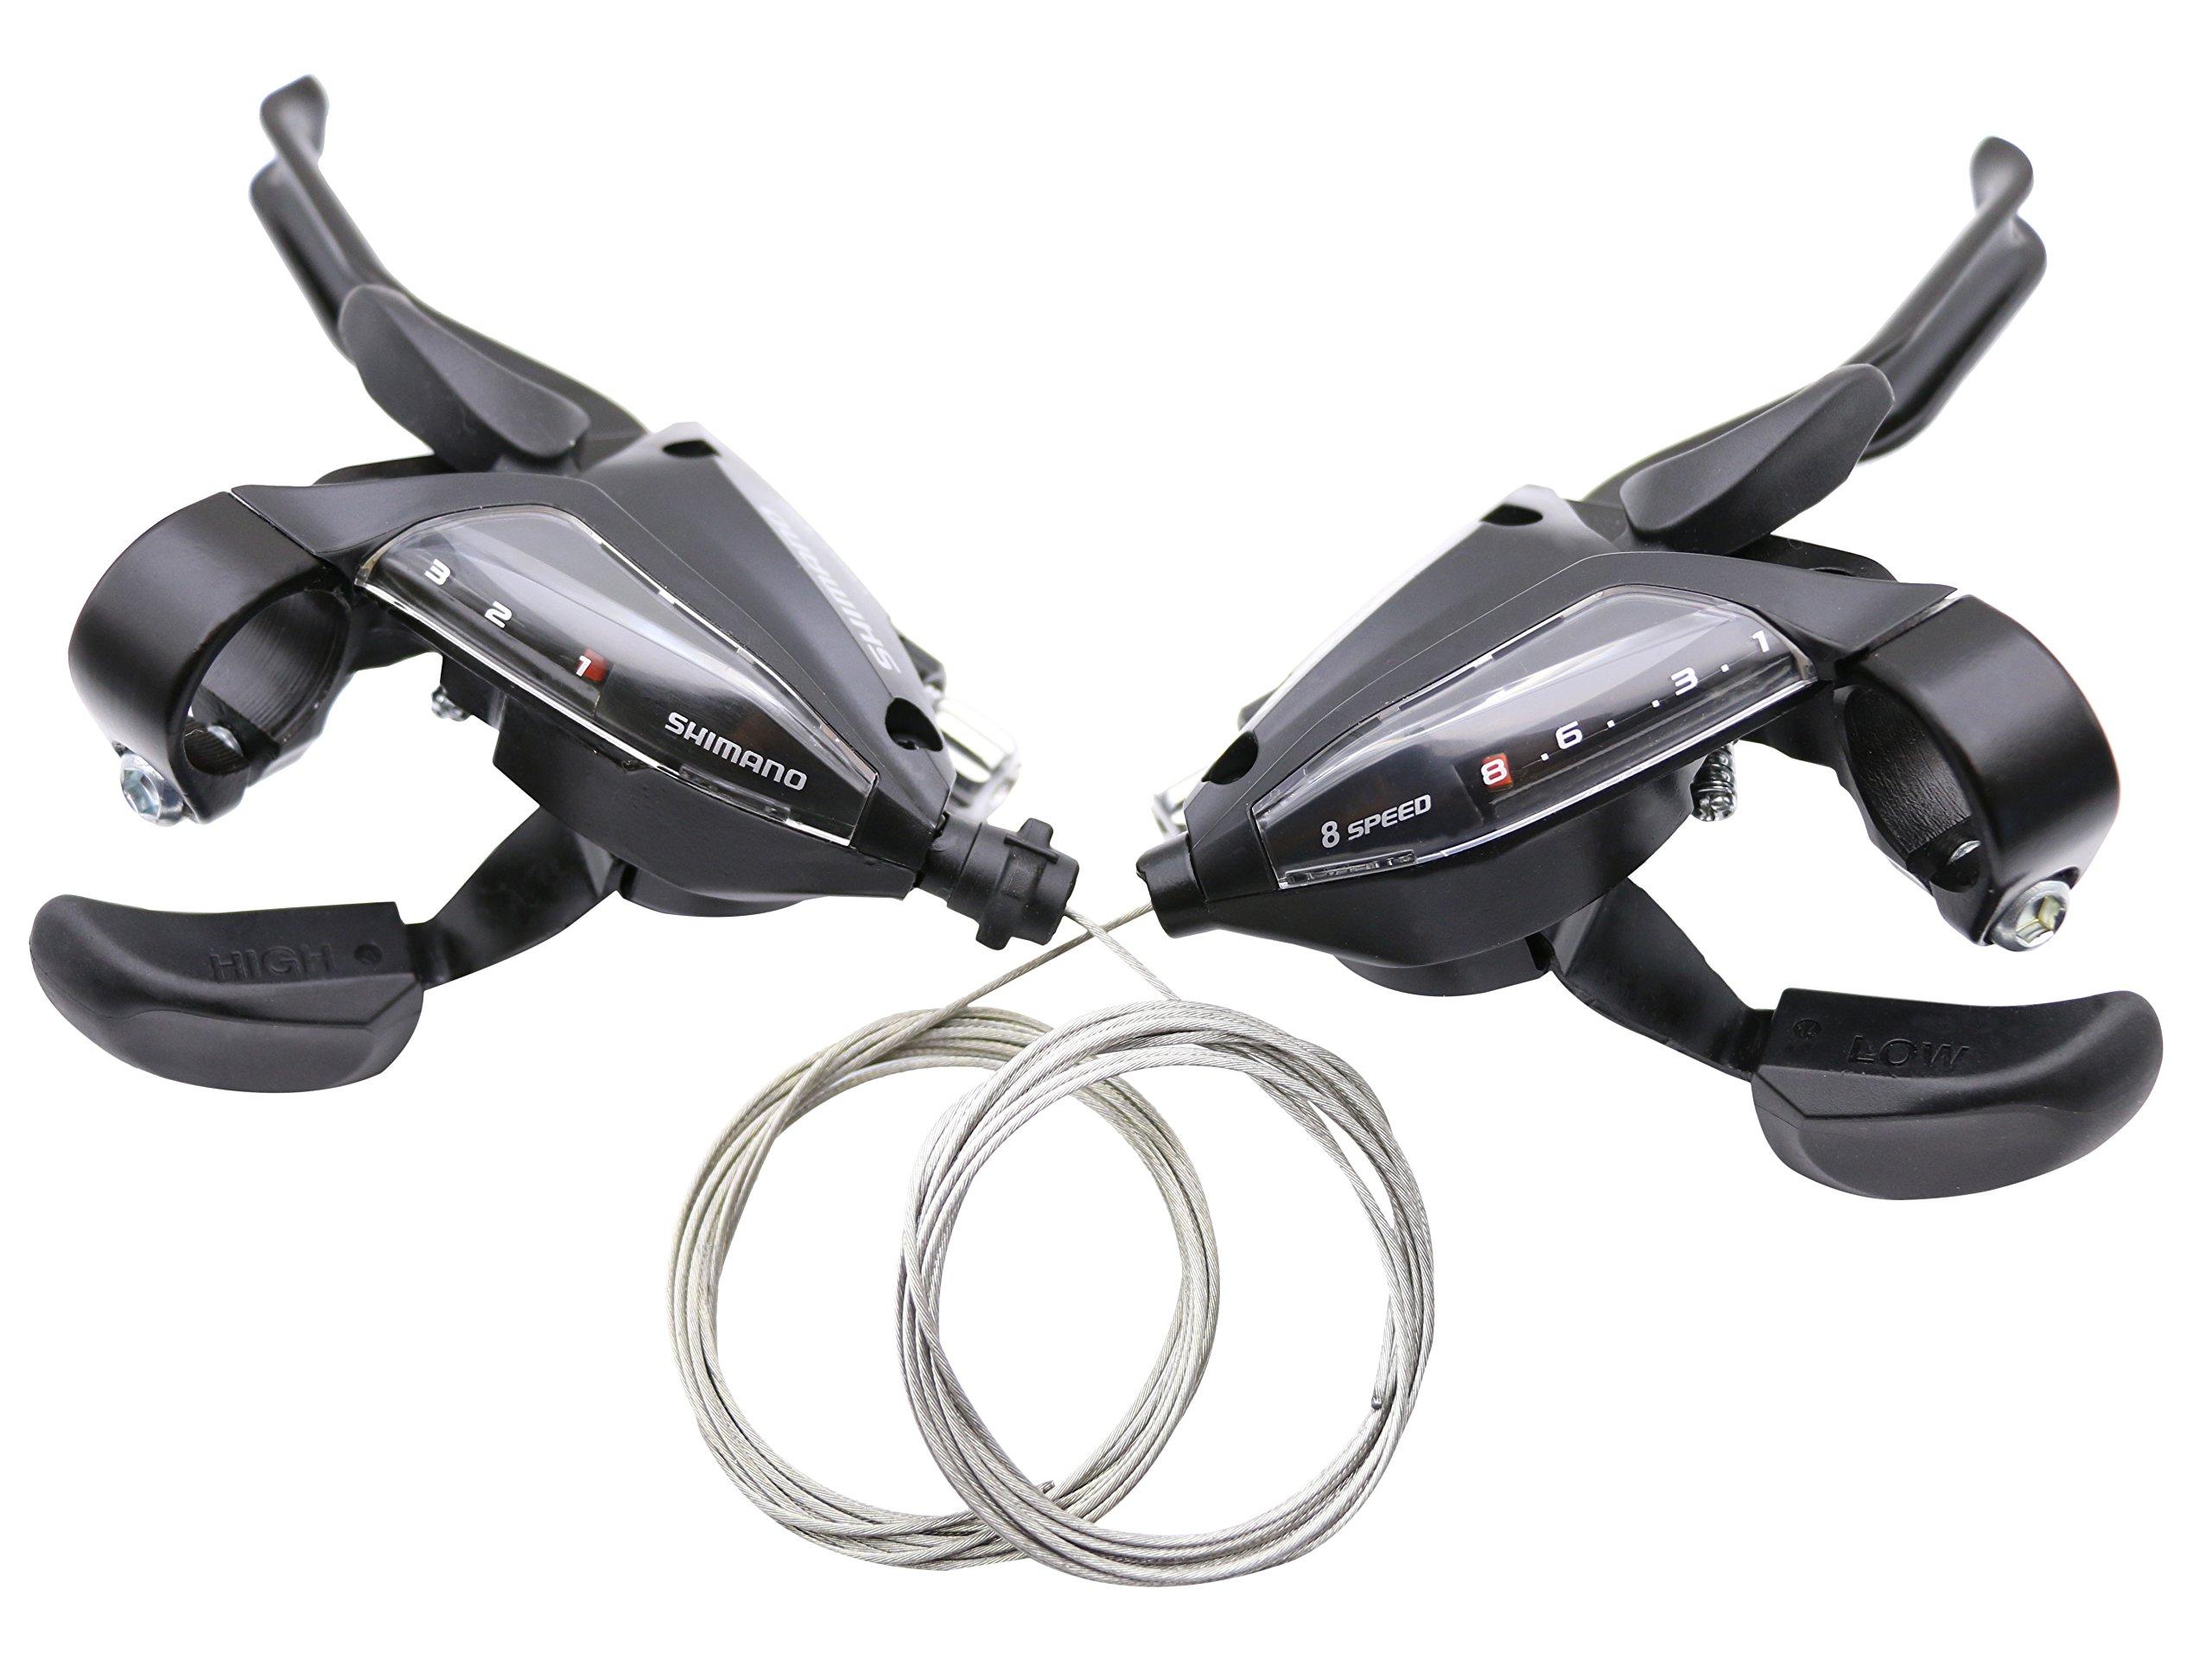 INKESKY Shimano Shifter ST-EF500 3x8 Speed Shift/Brake Lever Combo Set 3-Finger(Black, 1 Pair)